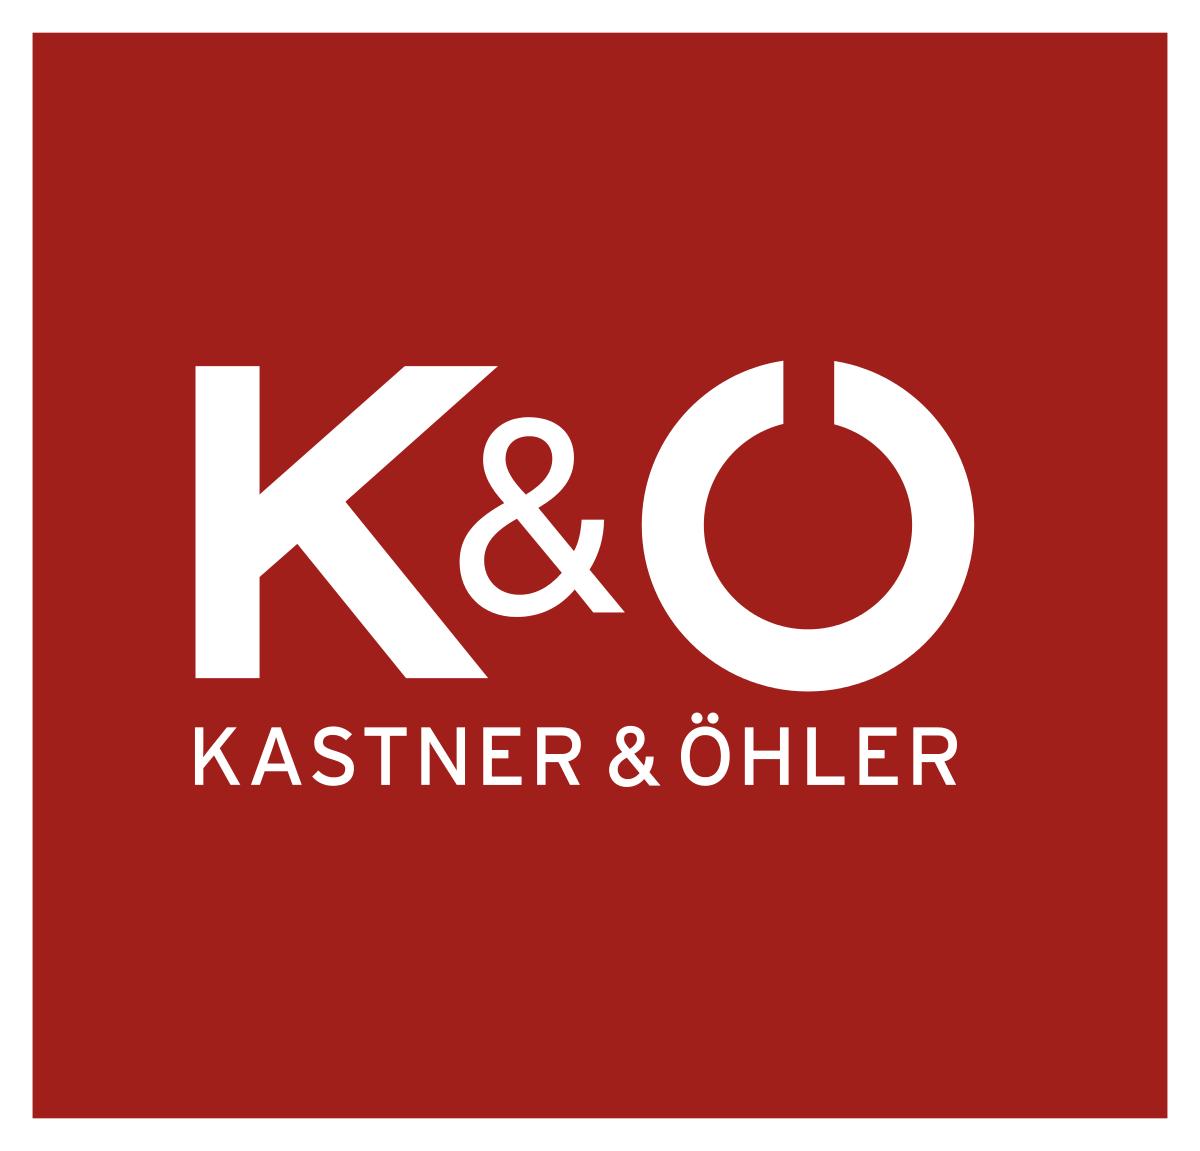 Kastner & Öhler - 20% Rabatt auf alles (inkl. Sale)